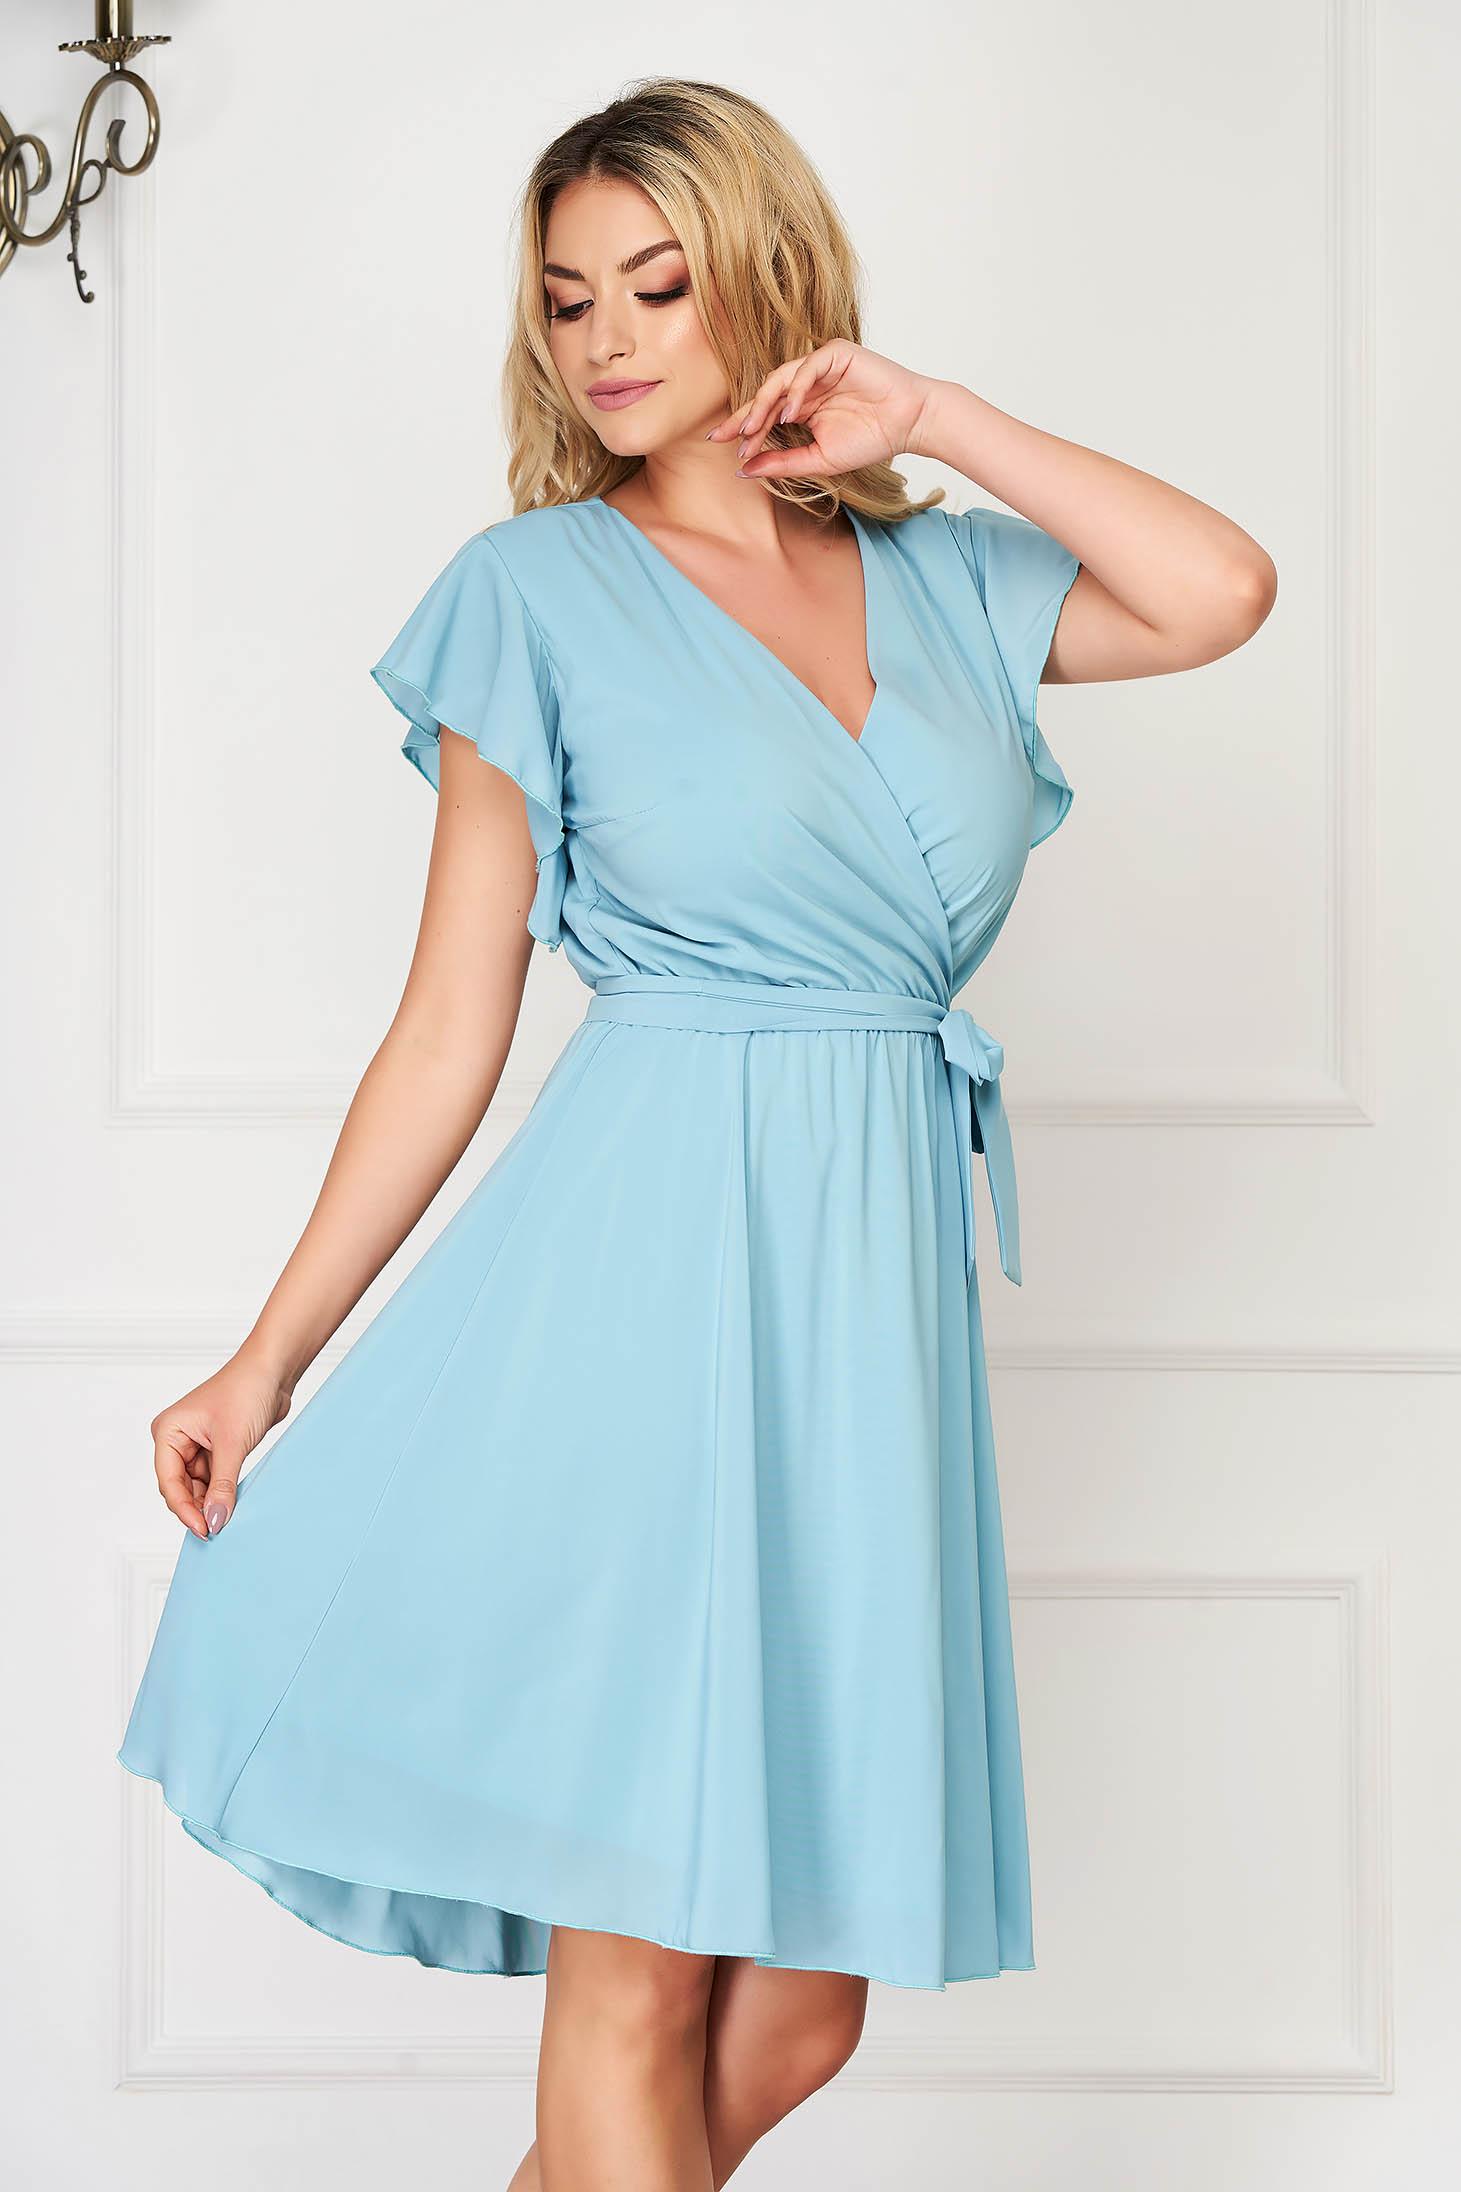 StarShinerS mint dress elegant midi from veil fabric with deep cleavage